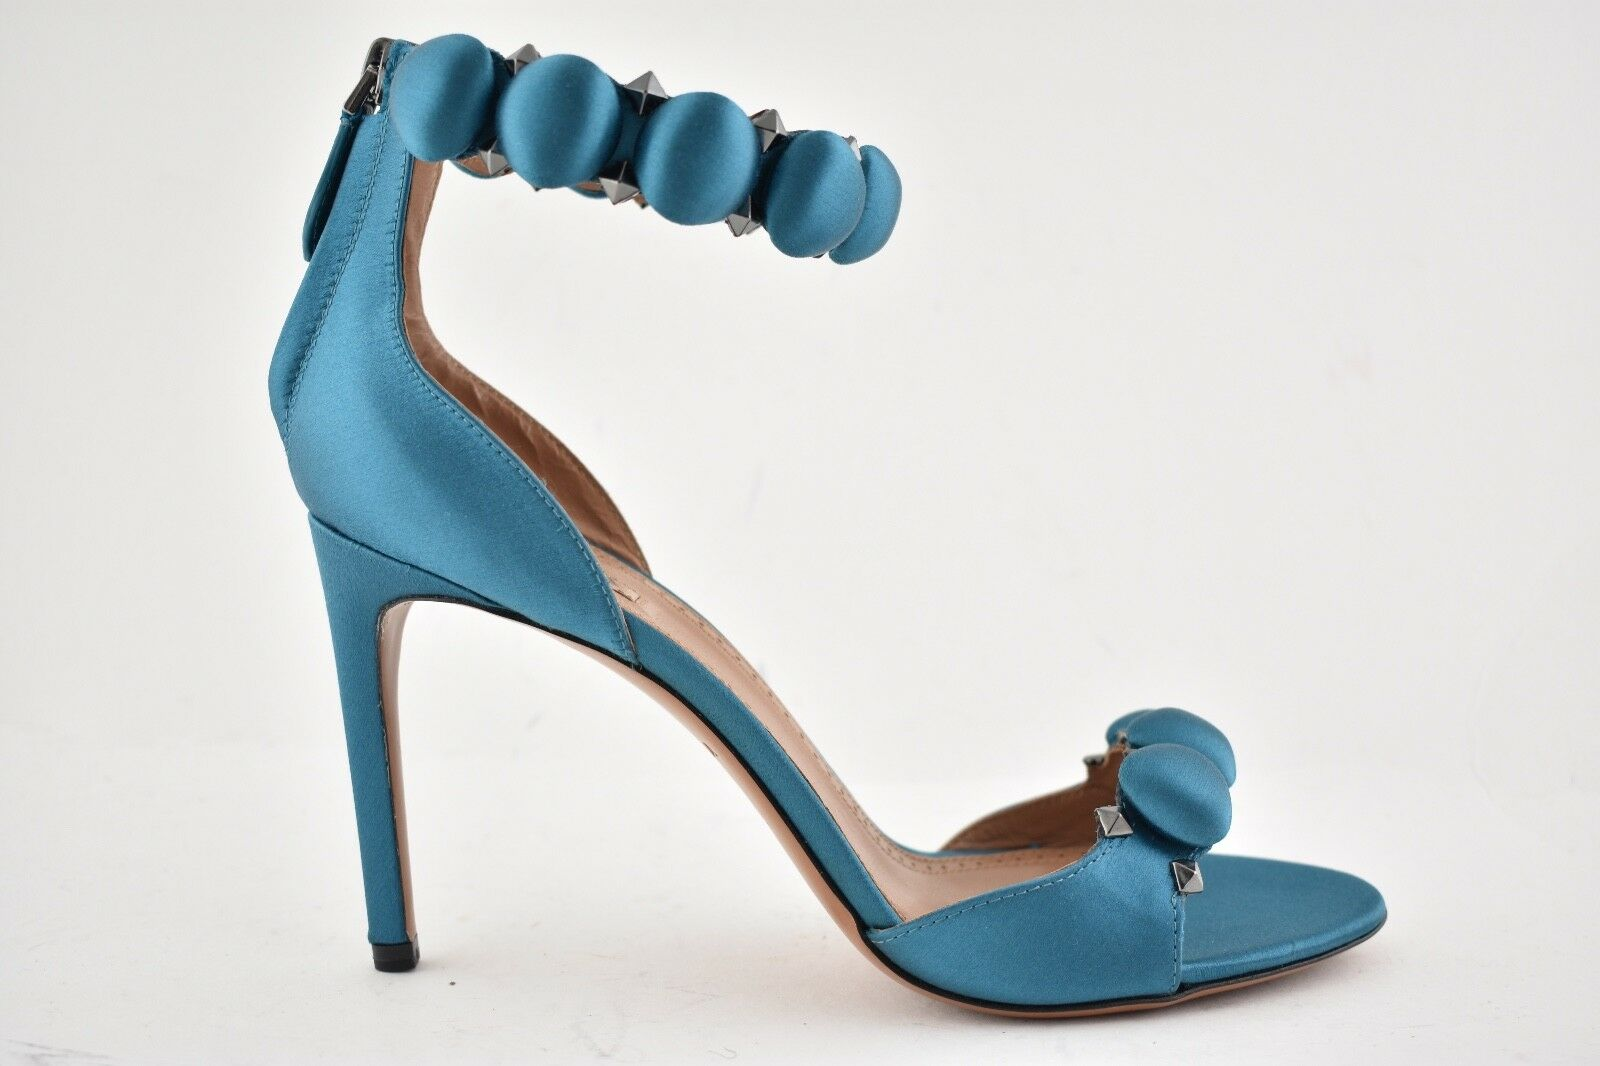 NIB Alaia Bombe 90mm bluee Canard Satin Studded Ankle Strap Sandal Heel Pump 36.5